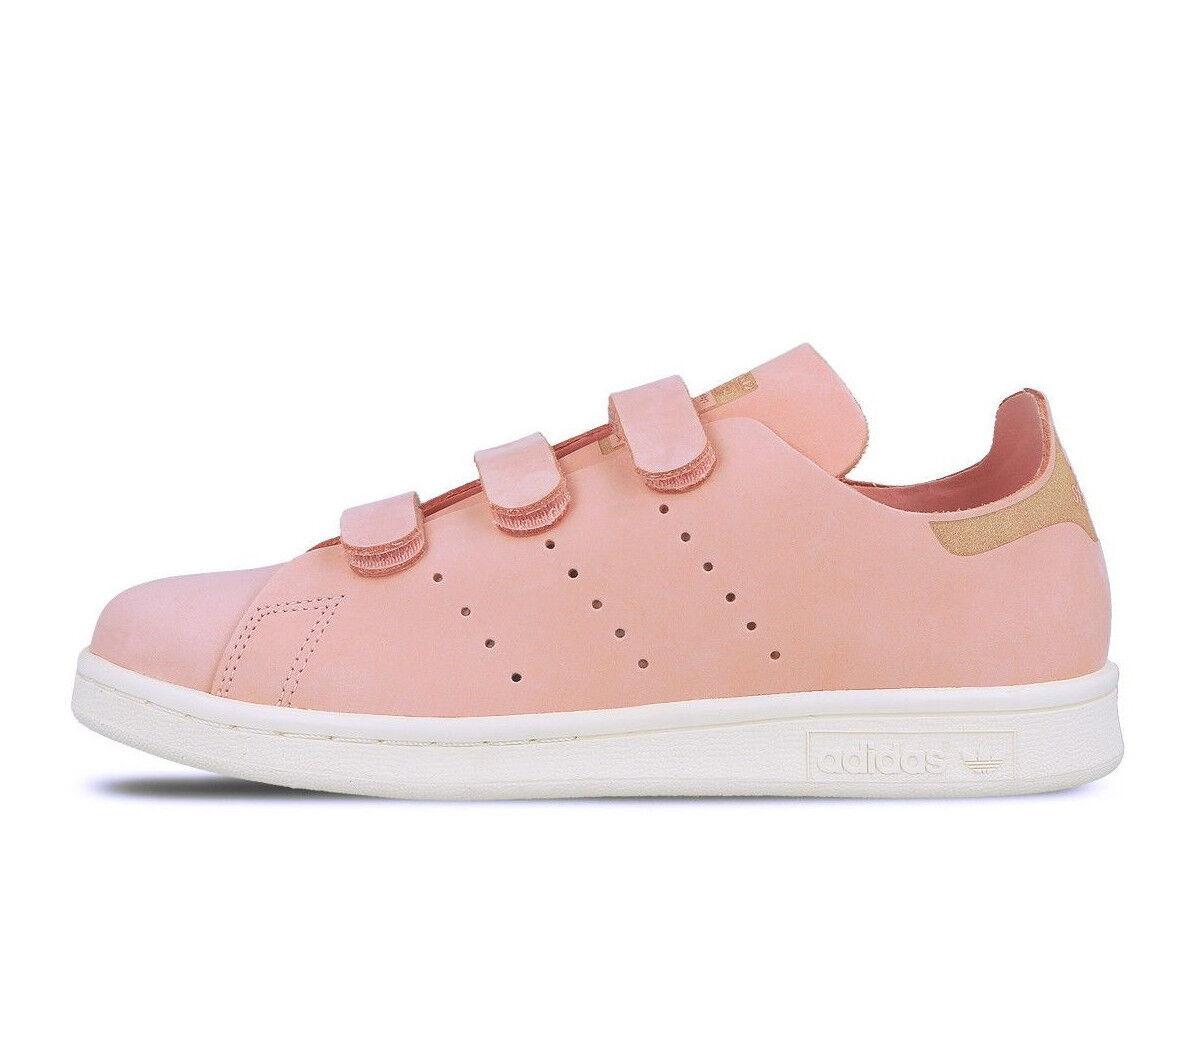 Adidas Stan Smith OP CF NEU pink rosa rar retro vintage leder superstar unisex